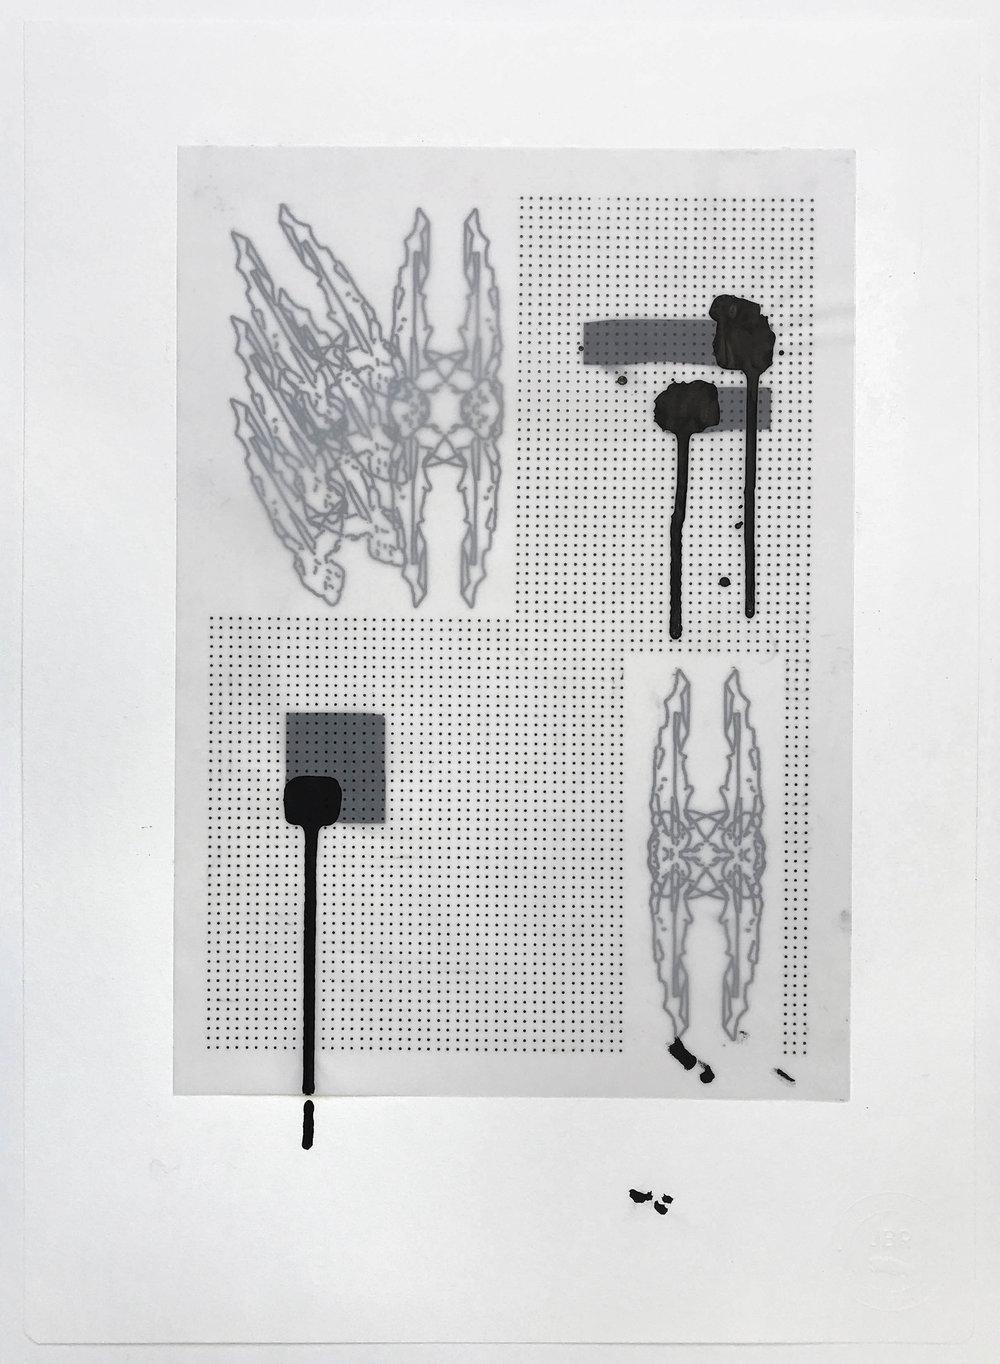 %22Entre tantas bisagras%22- Técnica mixta  - 42 x 30 cm - Julián Brangold - 2018.jpg